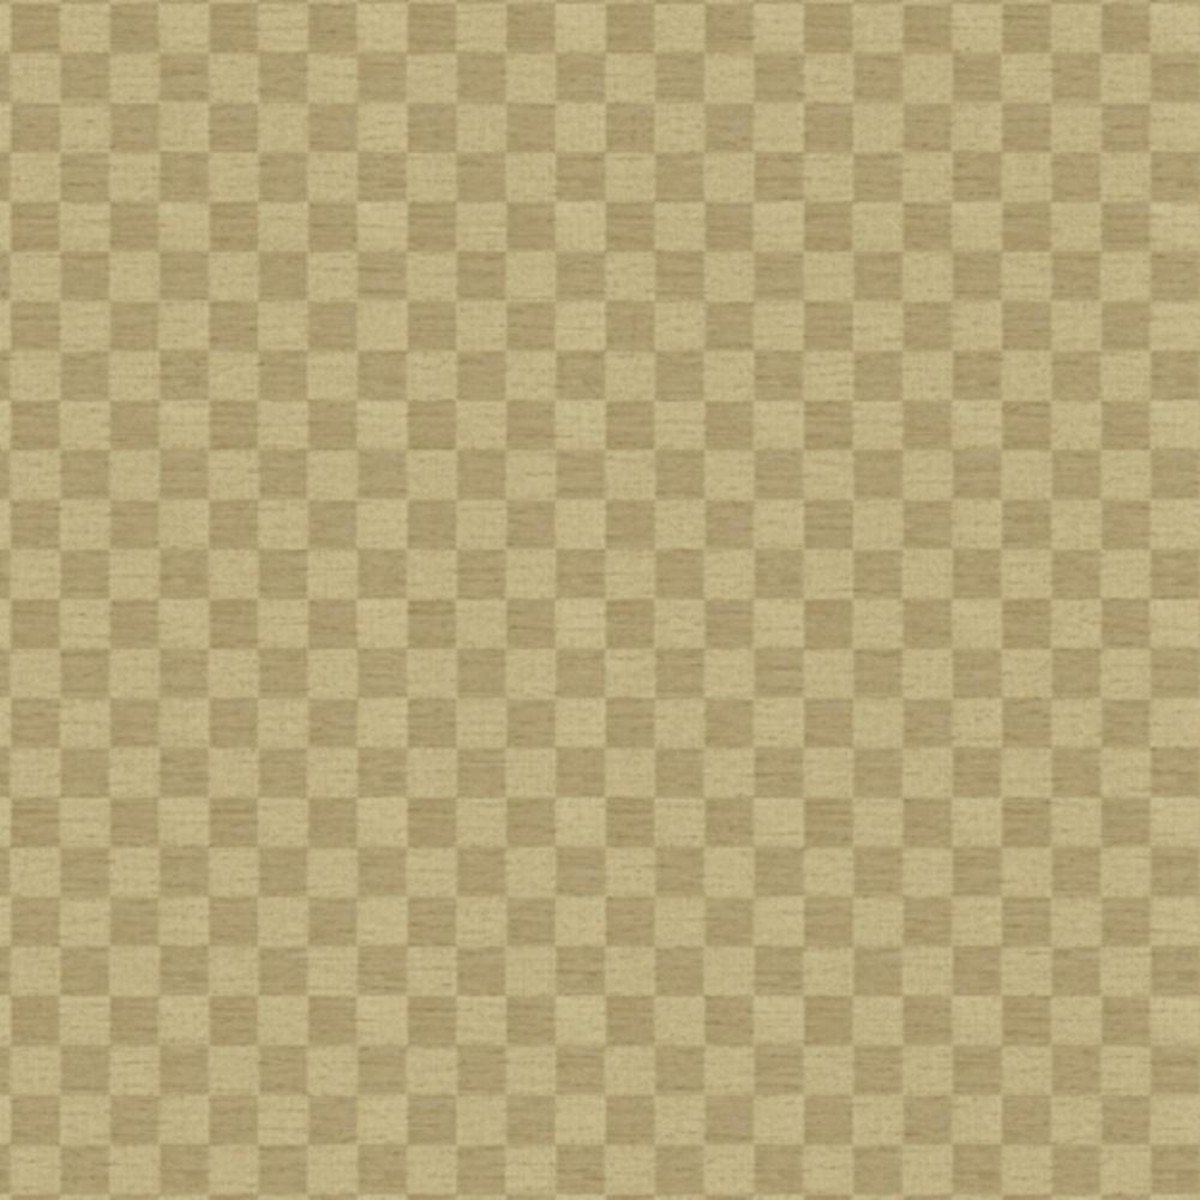 Обои виниловые Aura Texture World бежевые 0.53 м 530803